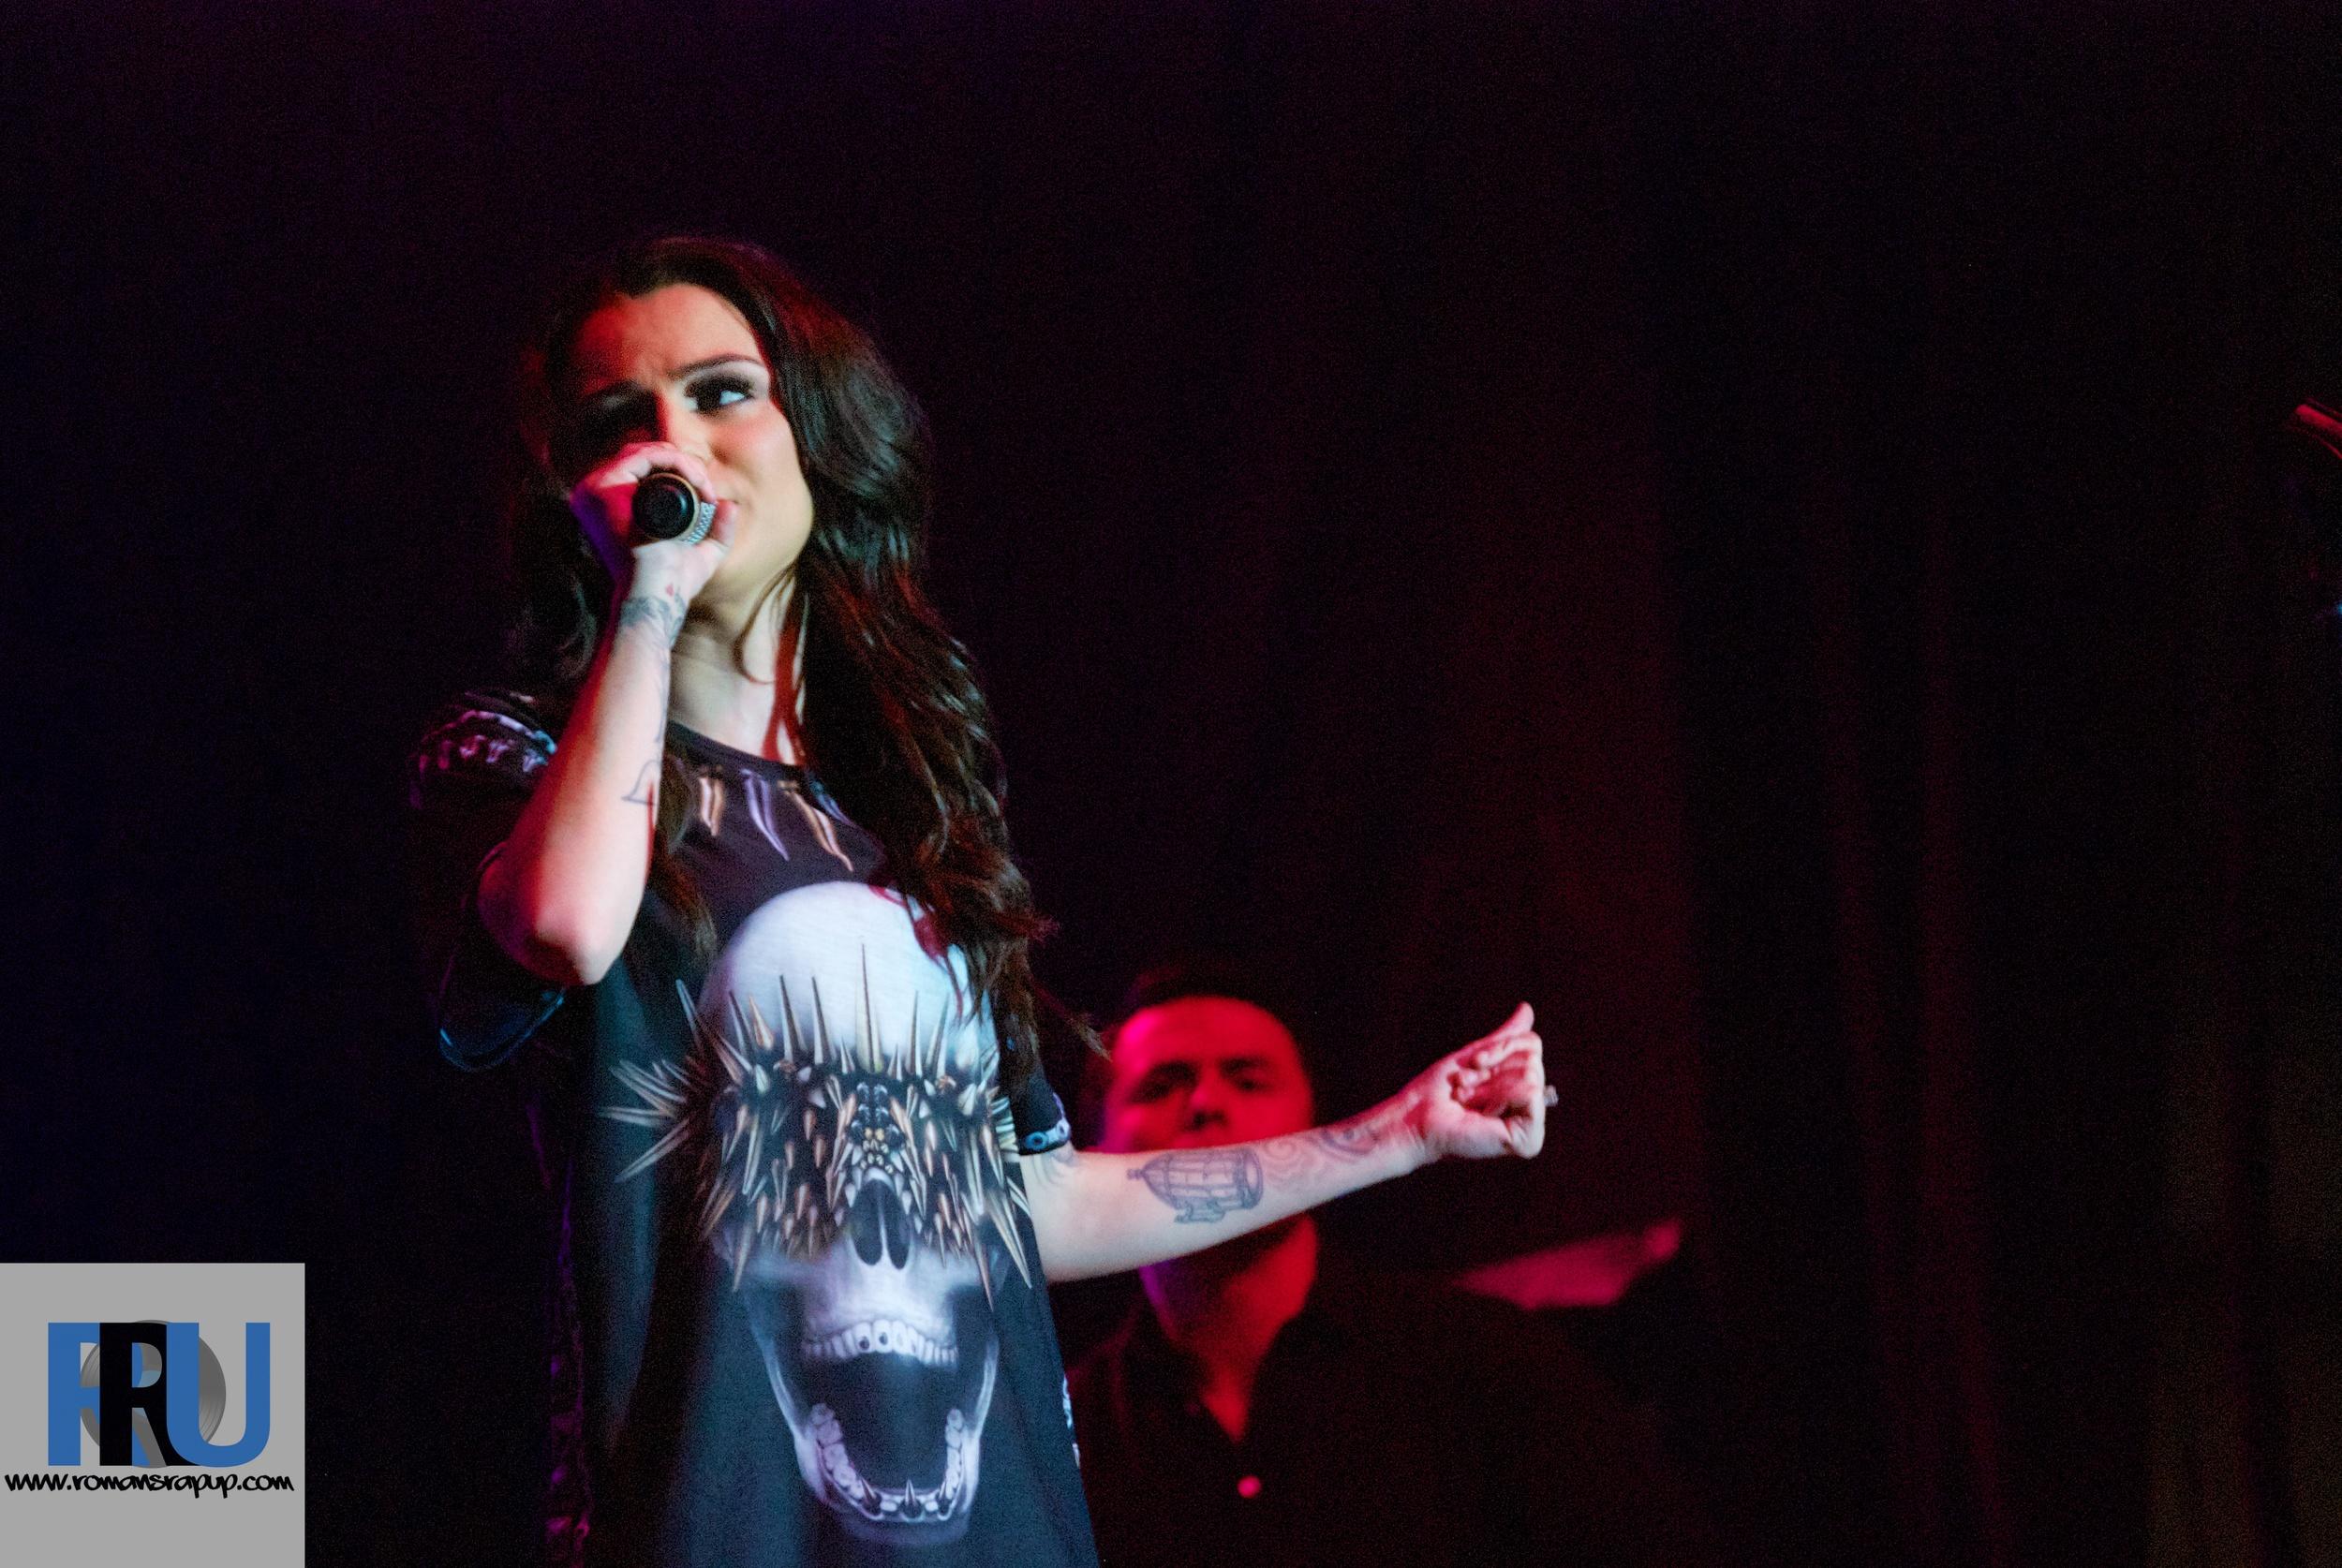 Cher Lloyd Topsfield Fair 10-12-13 24.jpg